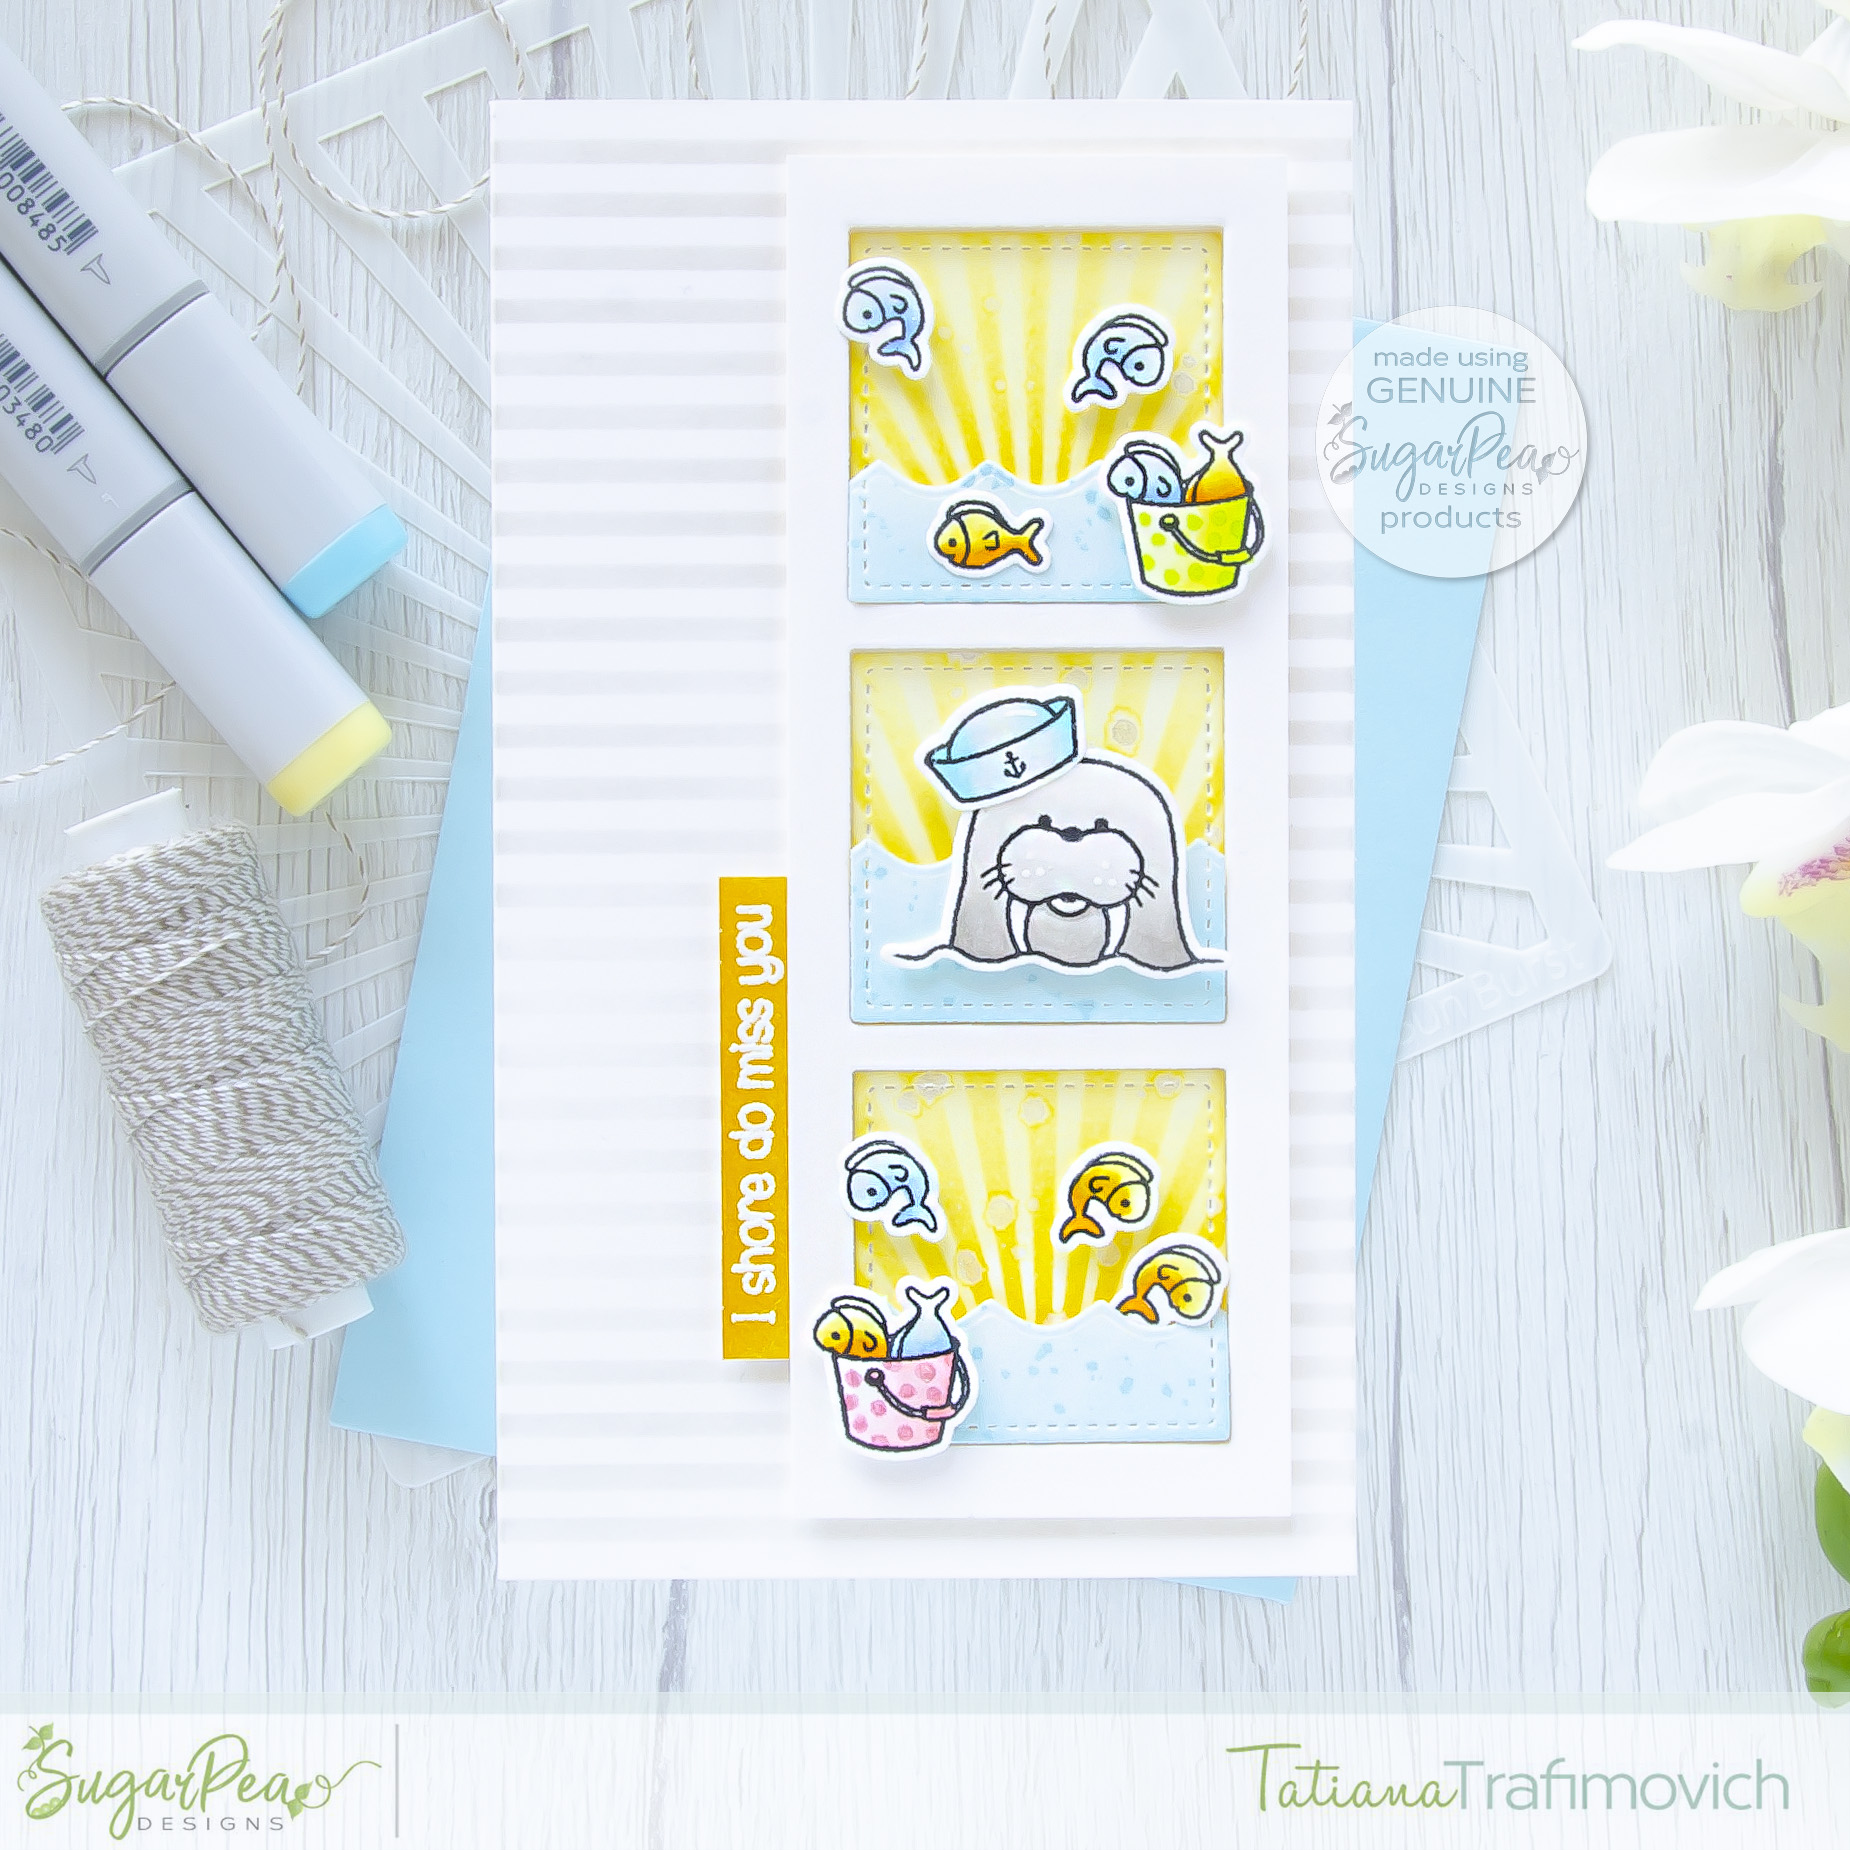 I Shore Do Miss You #handmade card by Tatiana Trafimovich #tatianacraftandart - Waves of Love stamp set by SugarPea Designs #sugarpeadesigns